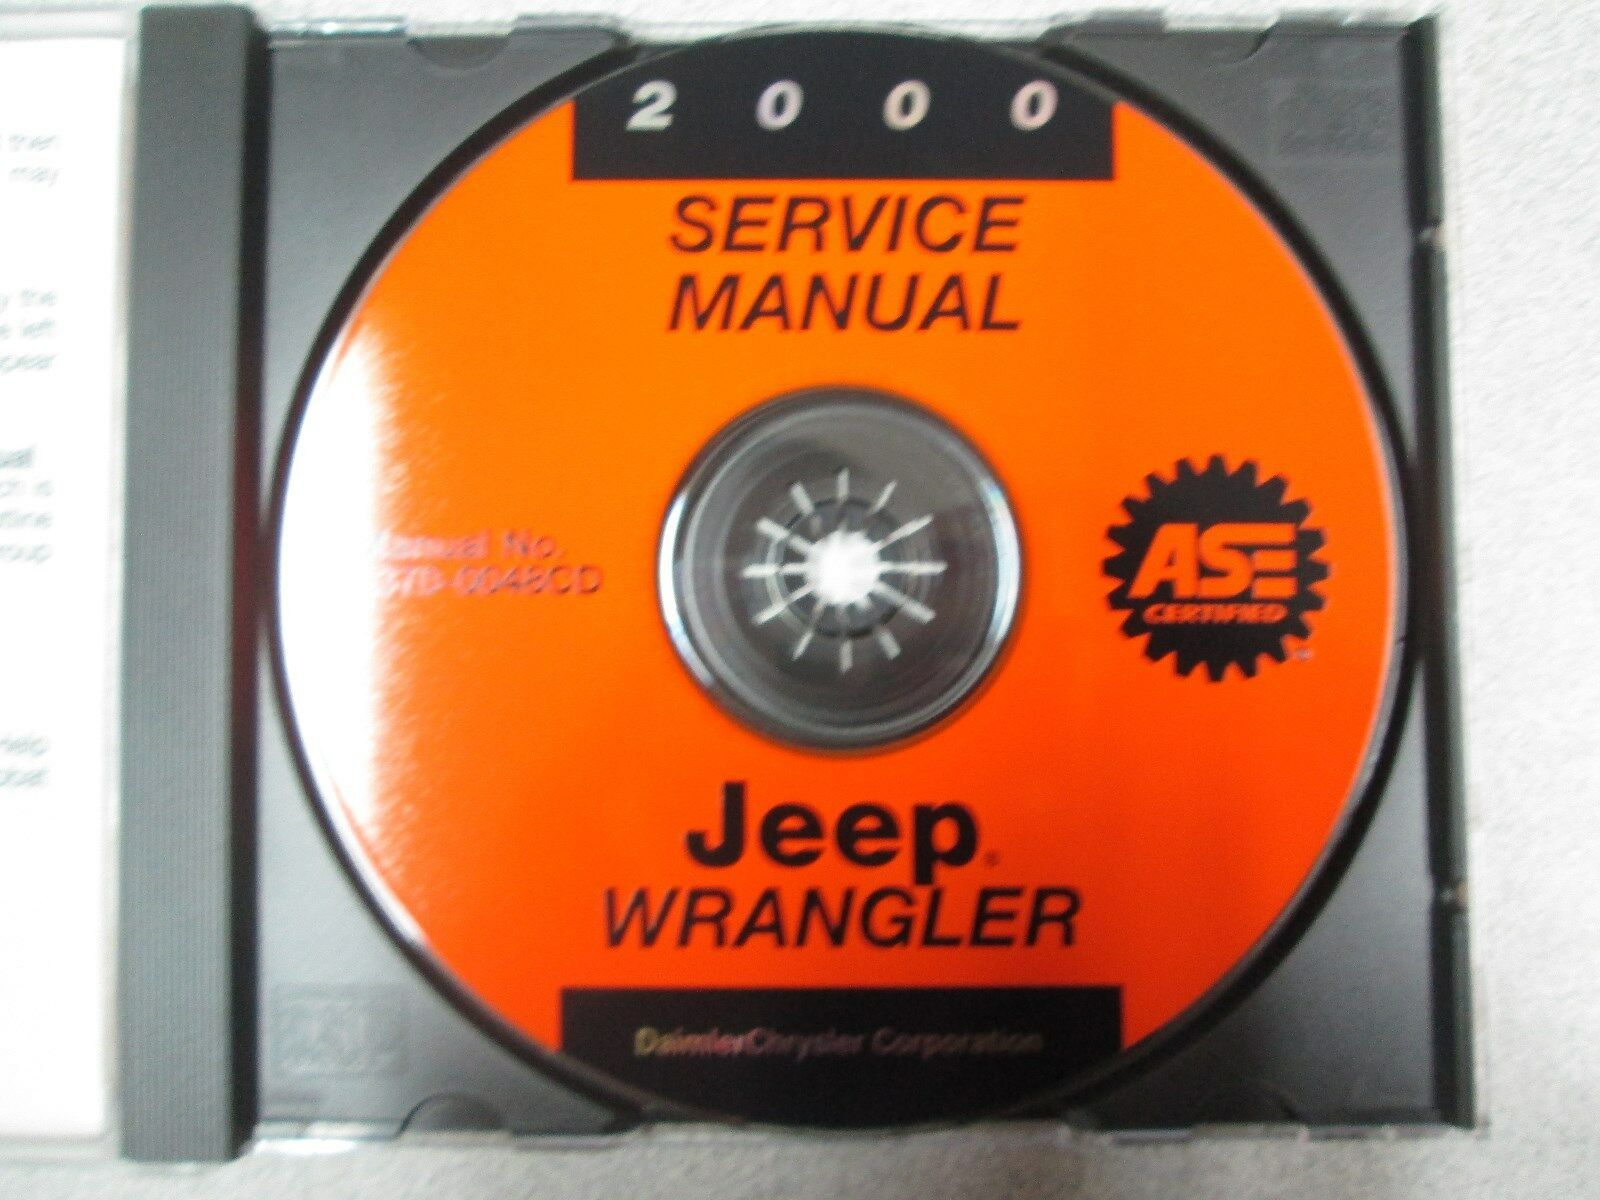 2000 JEEP WRANGLER Service INFORMATION Shop Repair Manual CD OEM BRAND NEW